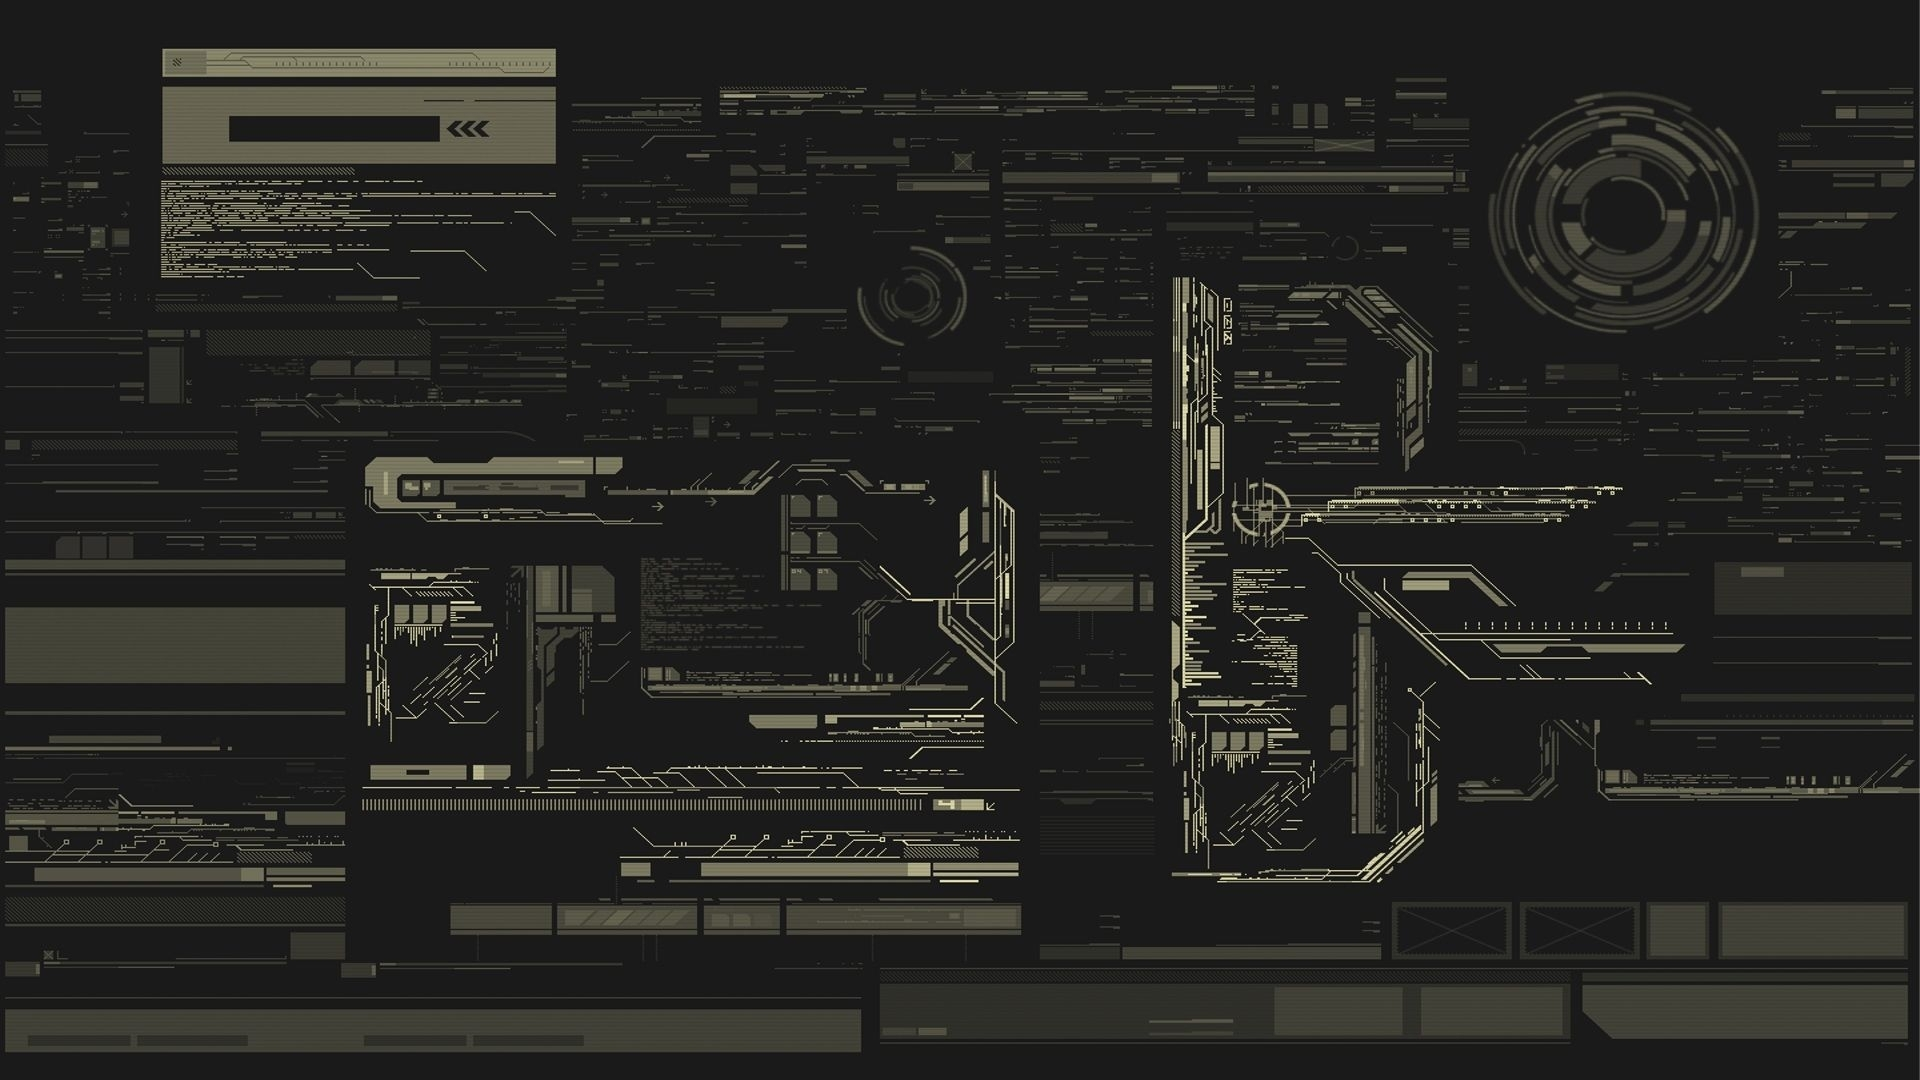 technology wallpapers 1920x1080 - impremedia